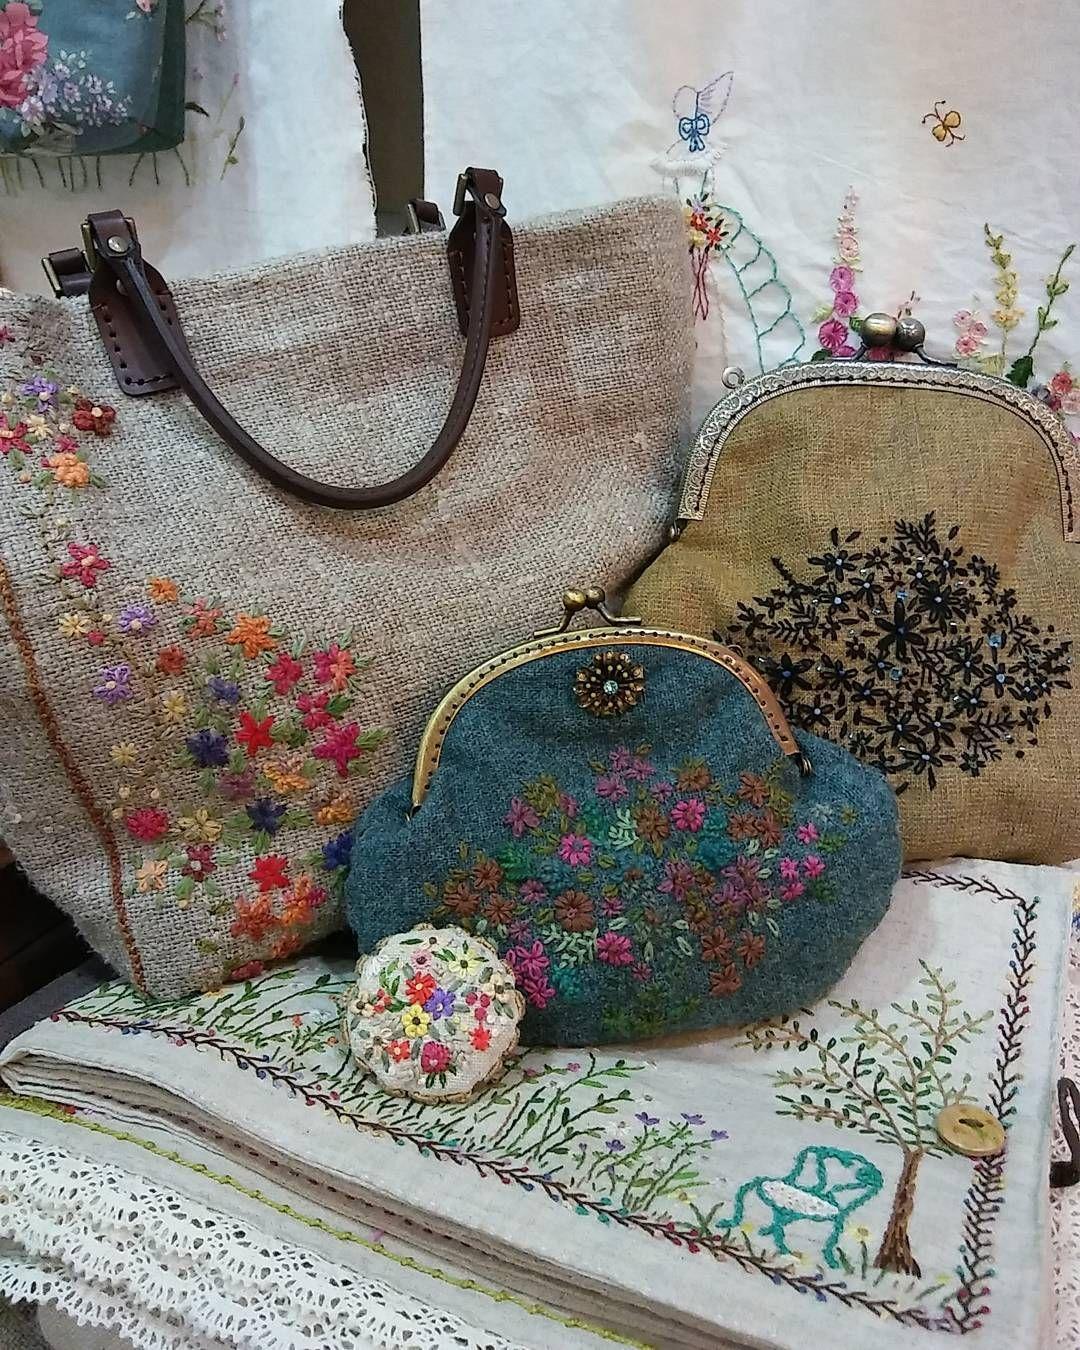 #Embroidery#stitch#needlework#hand made #프랑스자수#일산프랑스자수#자수#자수타그램#핸드매이드#자수가방#프레임파우치 #나의 이쁜 아가씨들. .